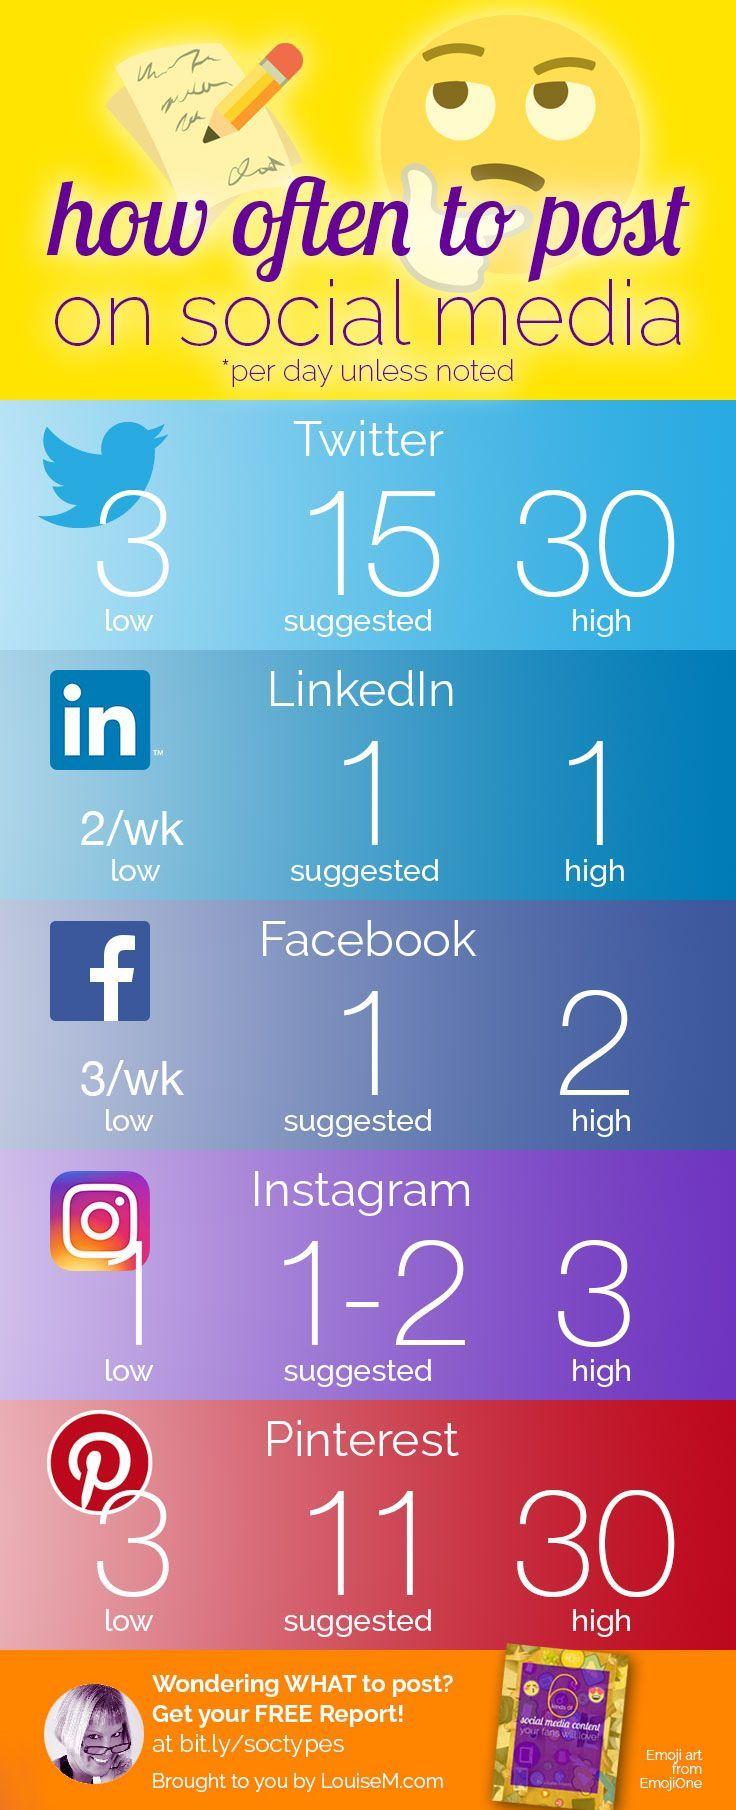 How Often To Post On Social Media 2020 Success Guide Marketing Strategy Social Media Social Media Infographic Social Media Business